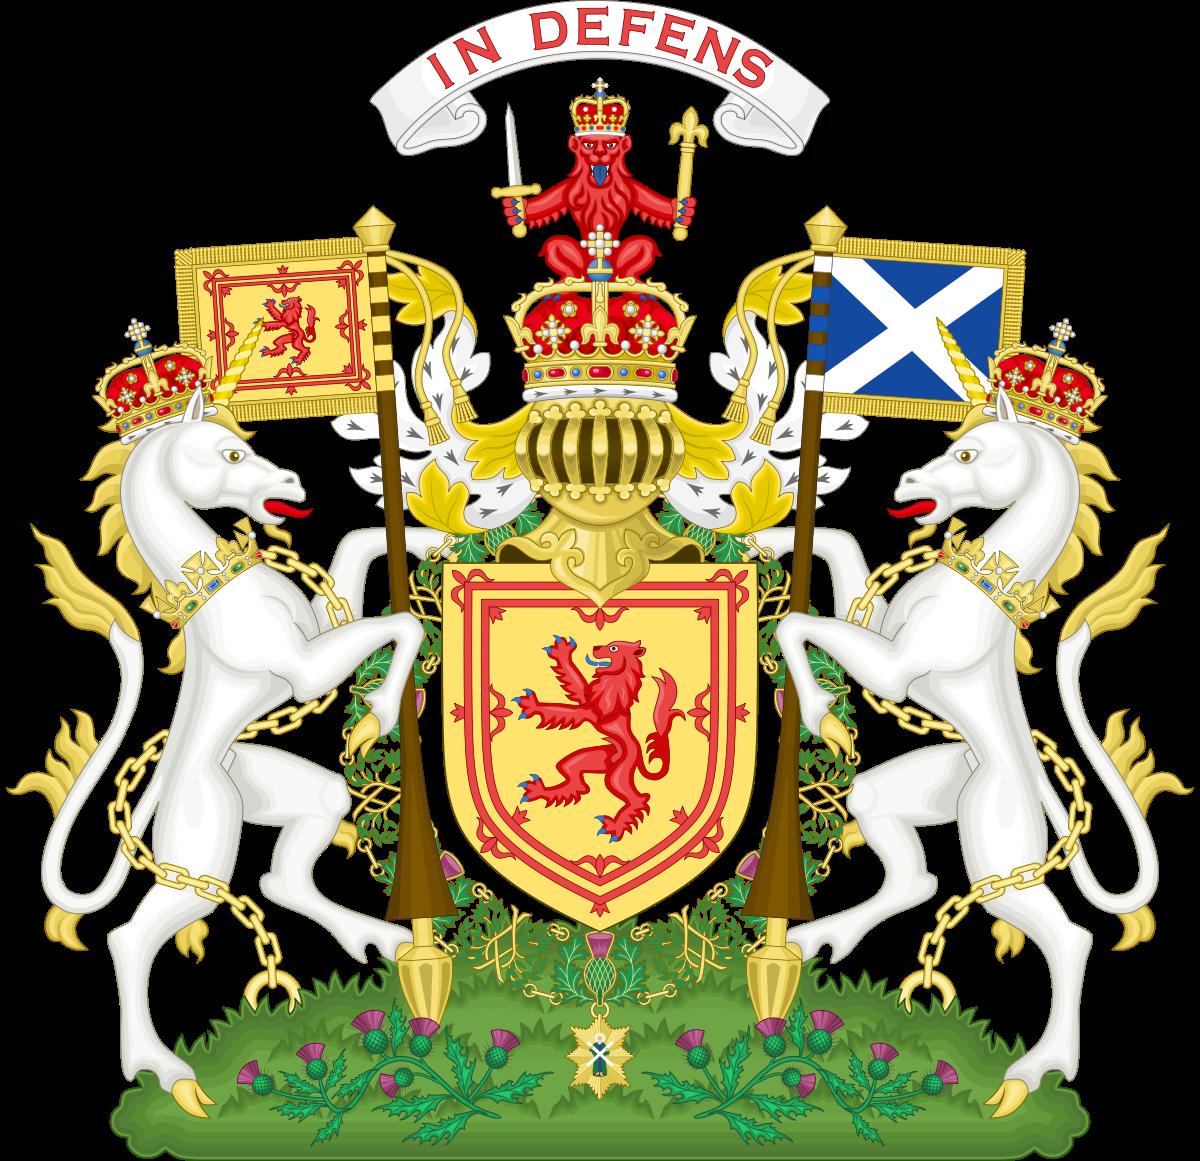 list of scottish monarchs wikipedia genealogy scotland coat of arms english monarchs. Black Bedroom Furniture Sets. Home Design Ideas